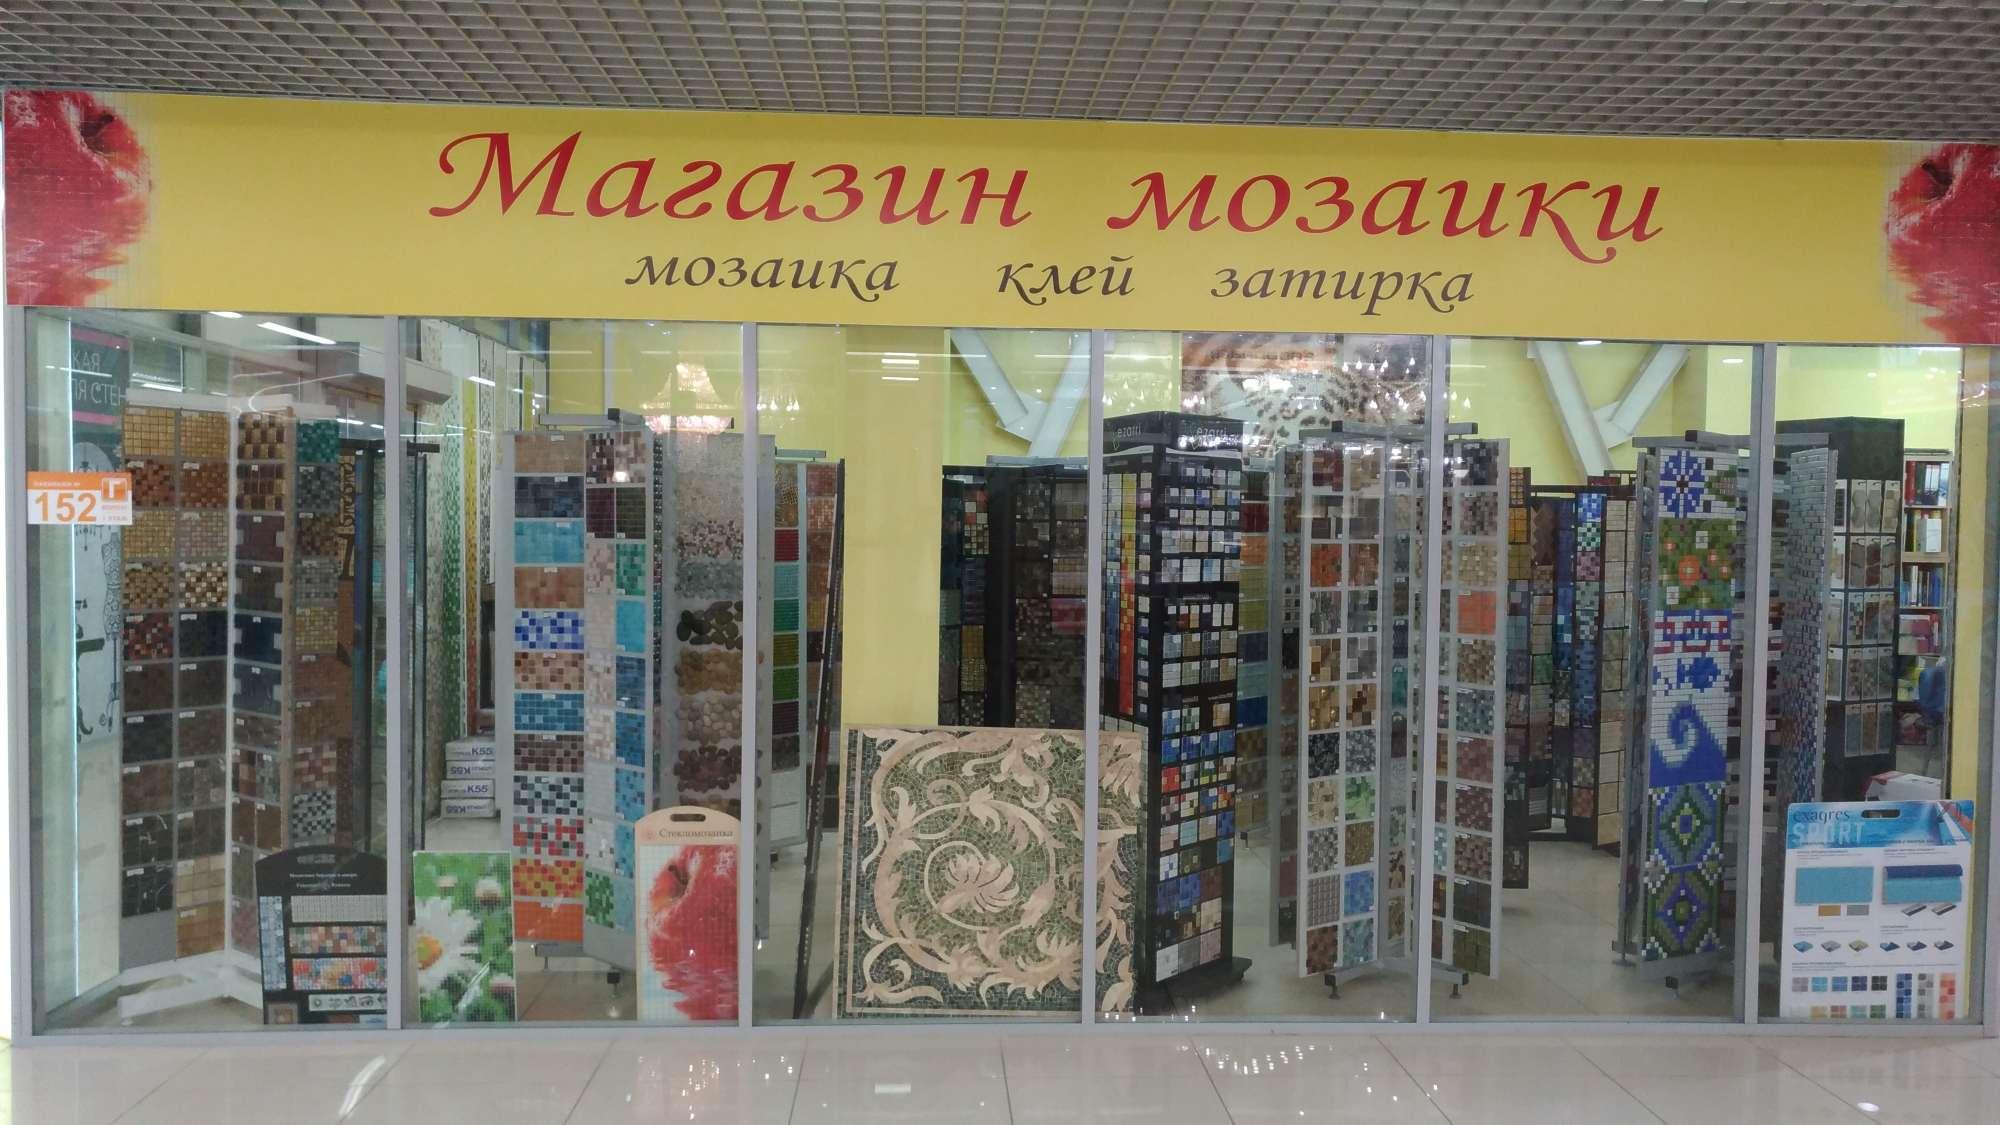 Мозаинка - Супермаркет мозаики